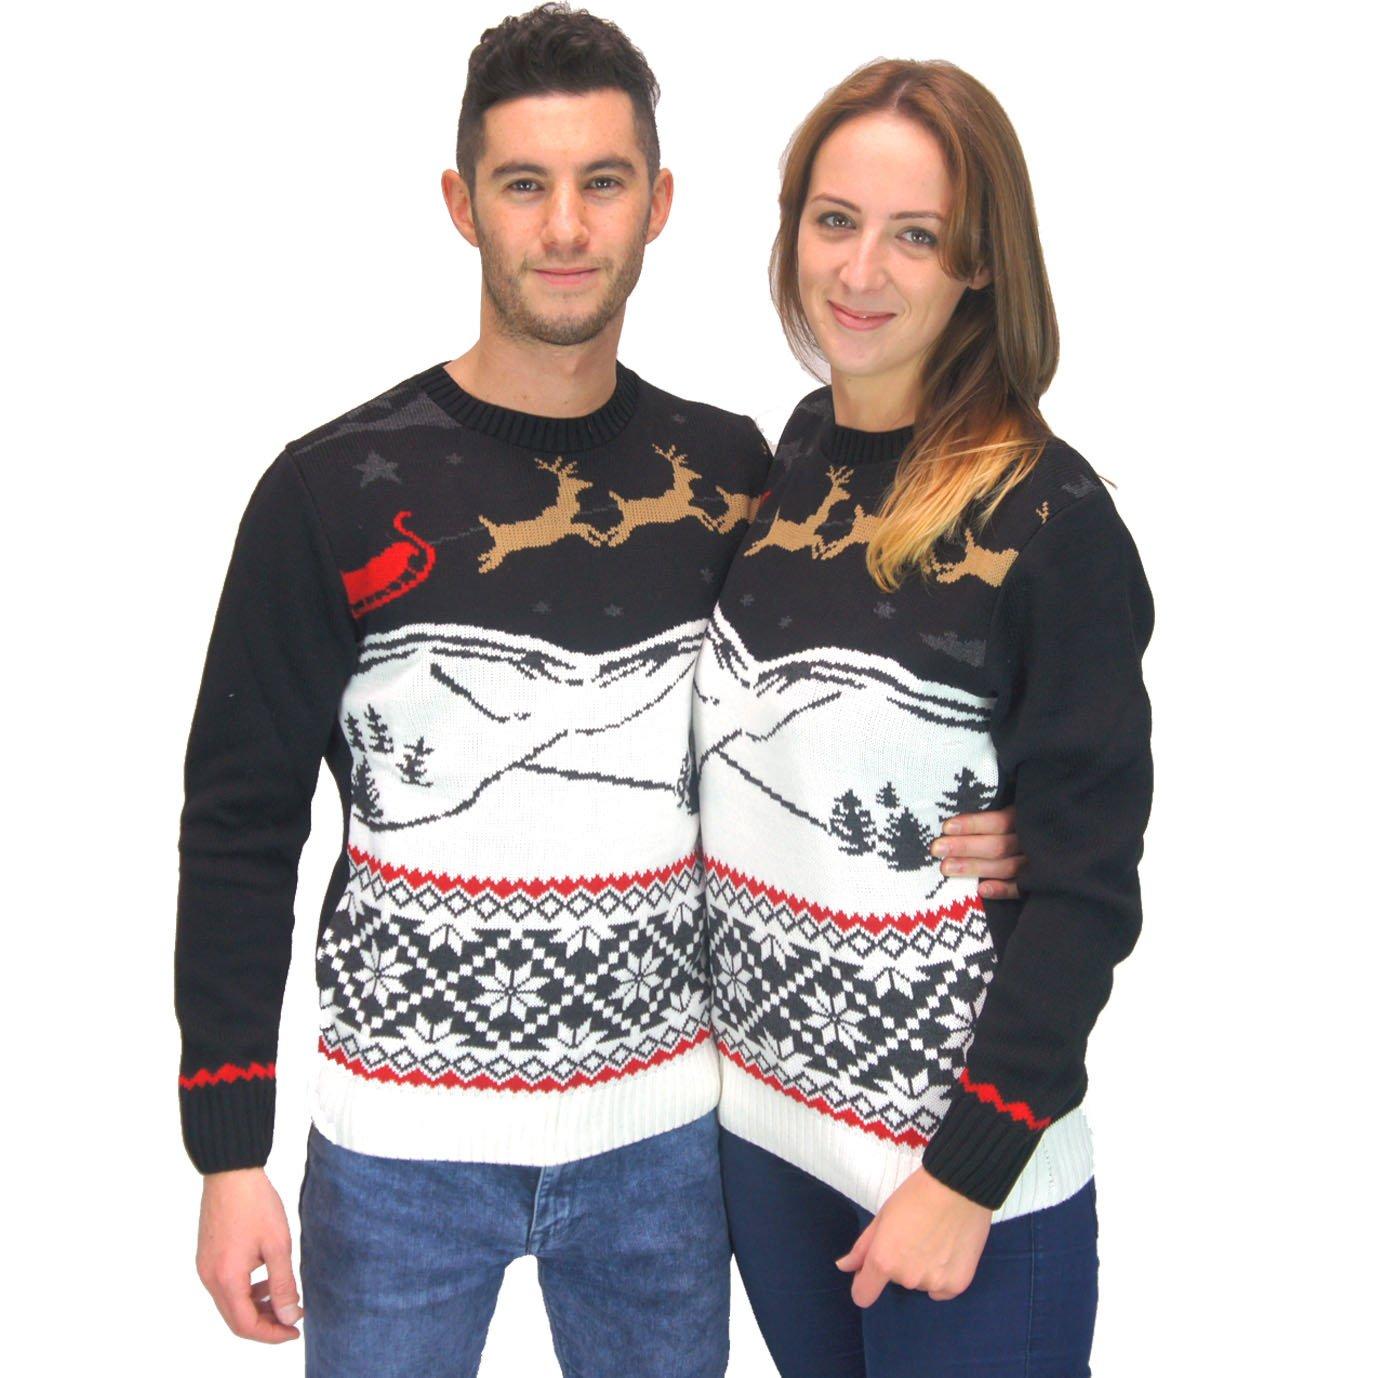 Reindeer Winter Christmas Sweater